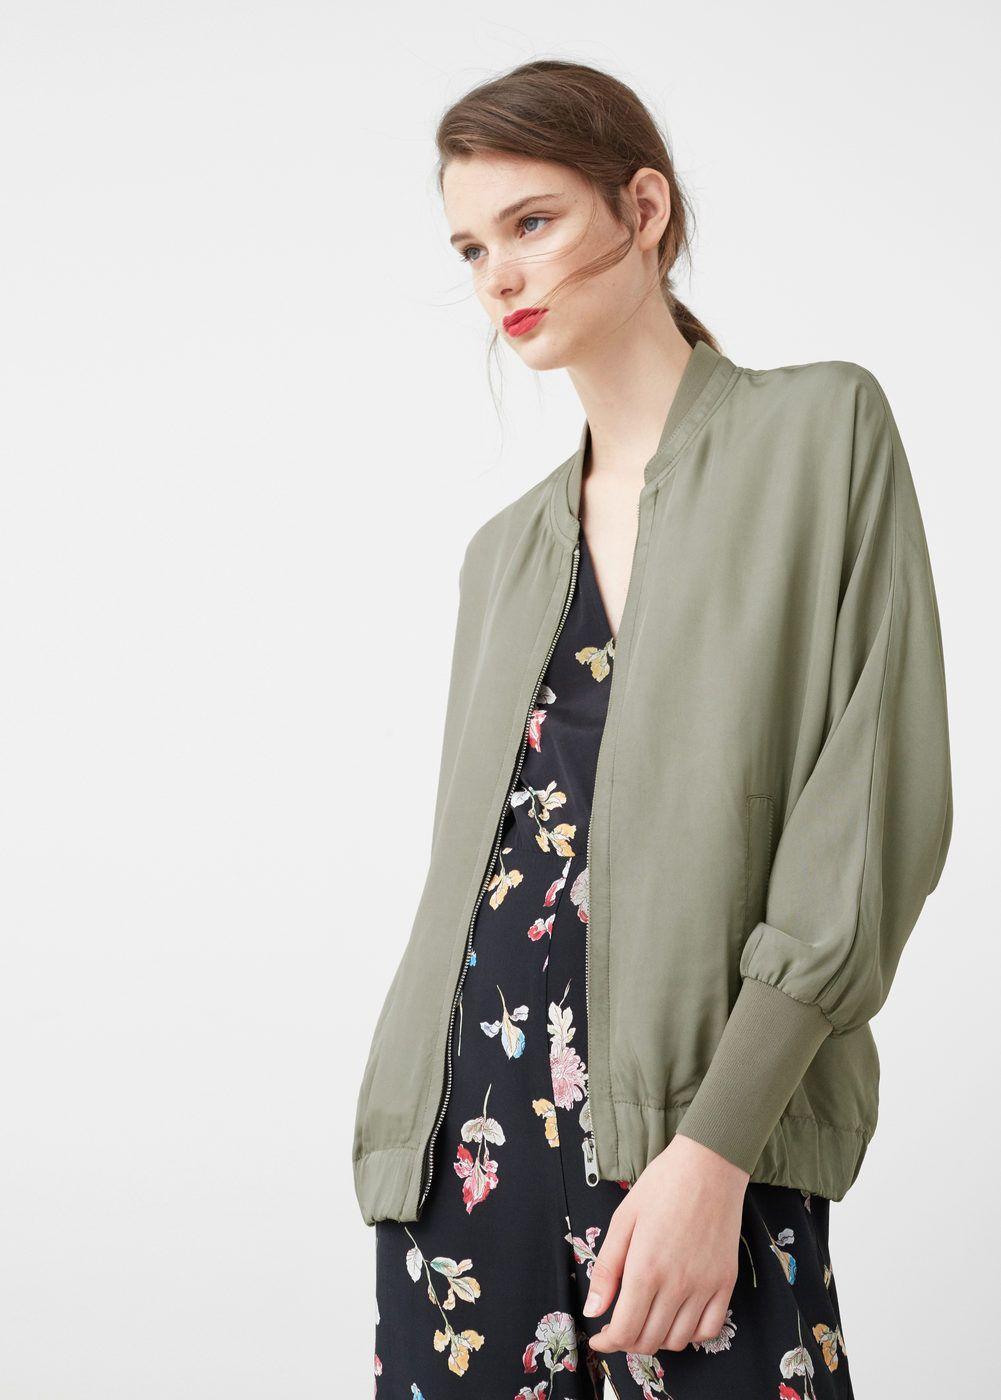 Jackets for women mango usa bomber pinterest fashion